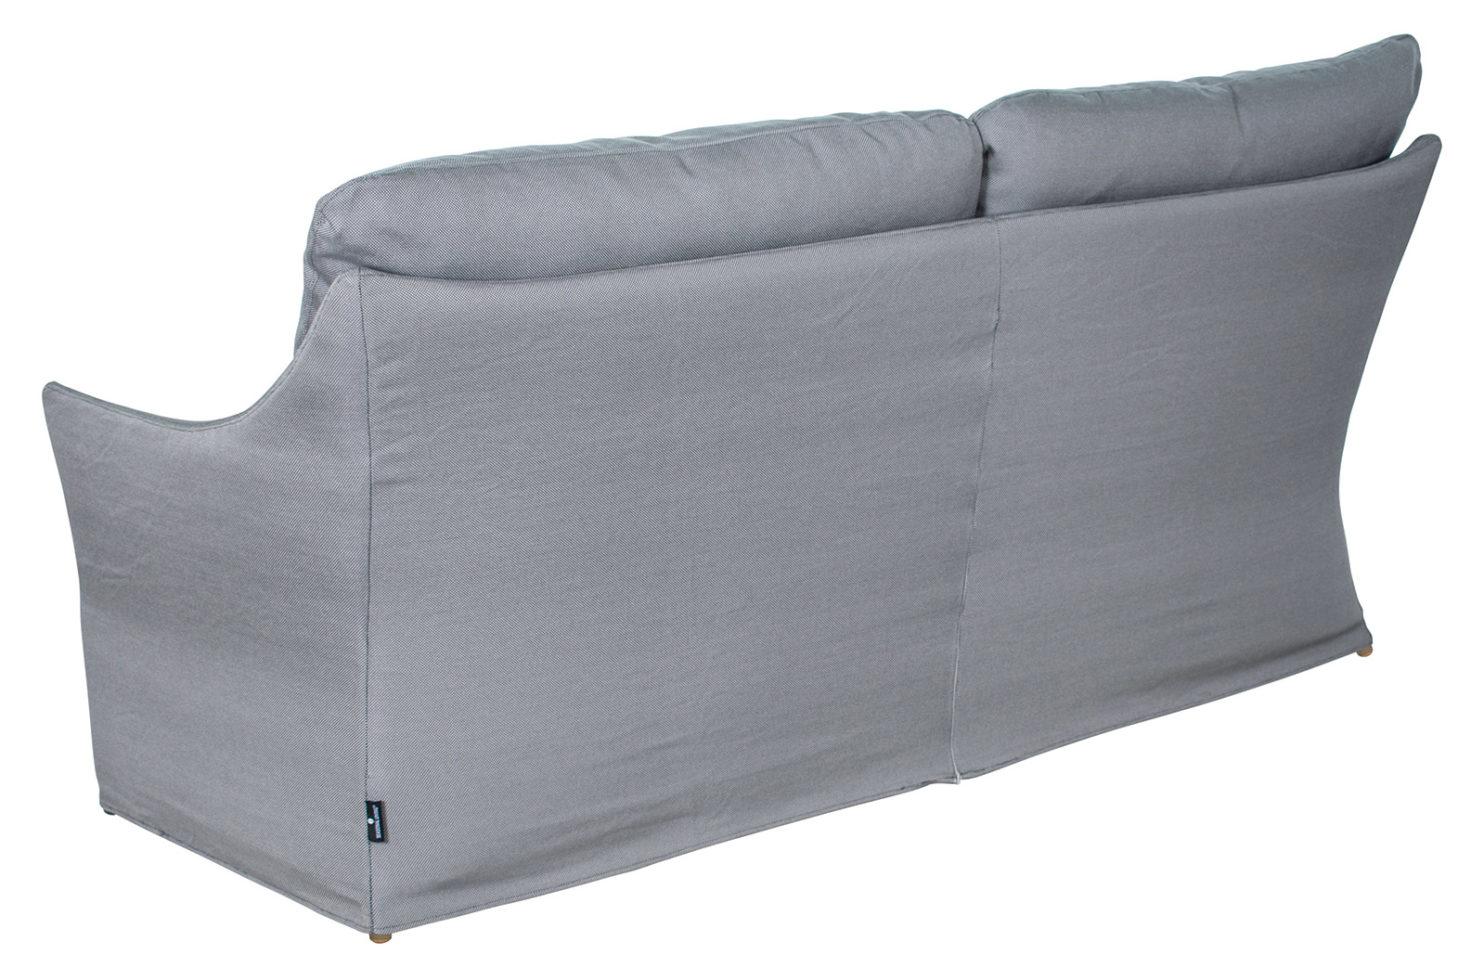 capri sofa 620FT094FC G 1 3Q back